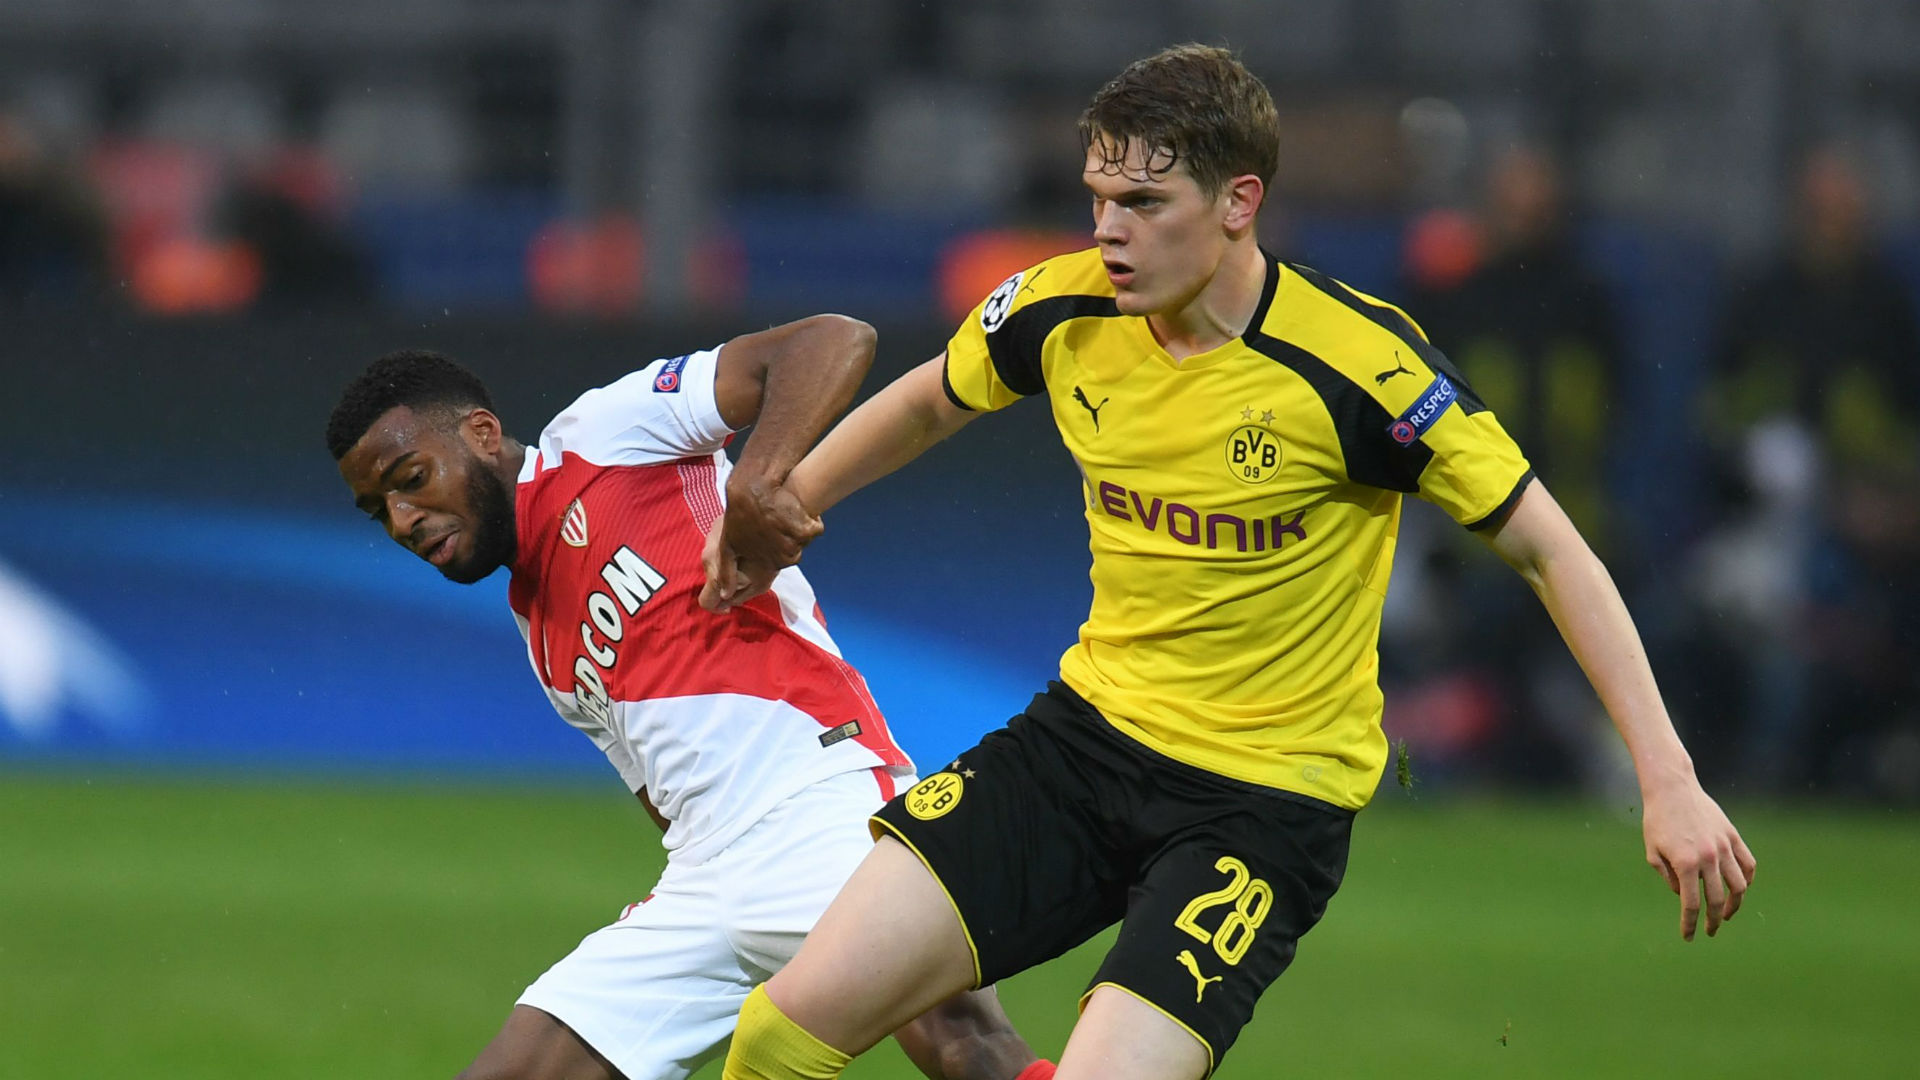 Thomas Lemar Monaco Matthias Ginter Borussia Dortmund